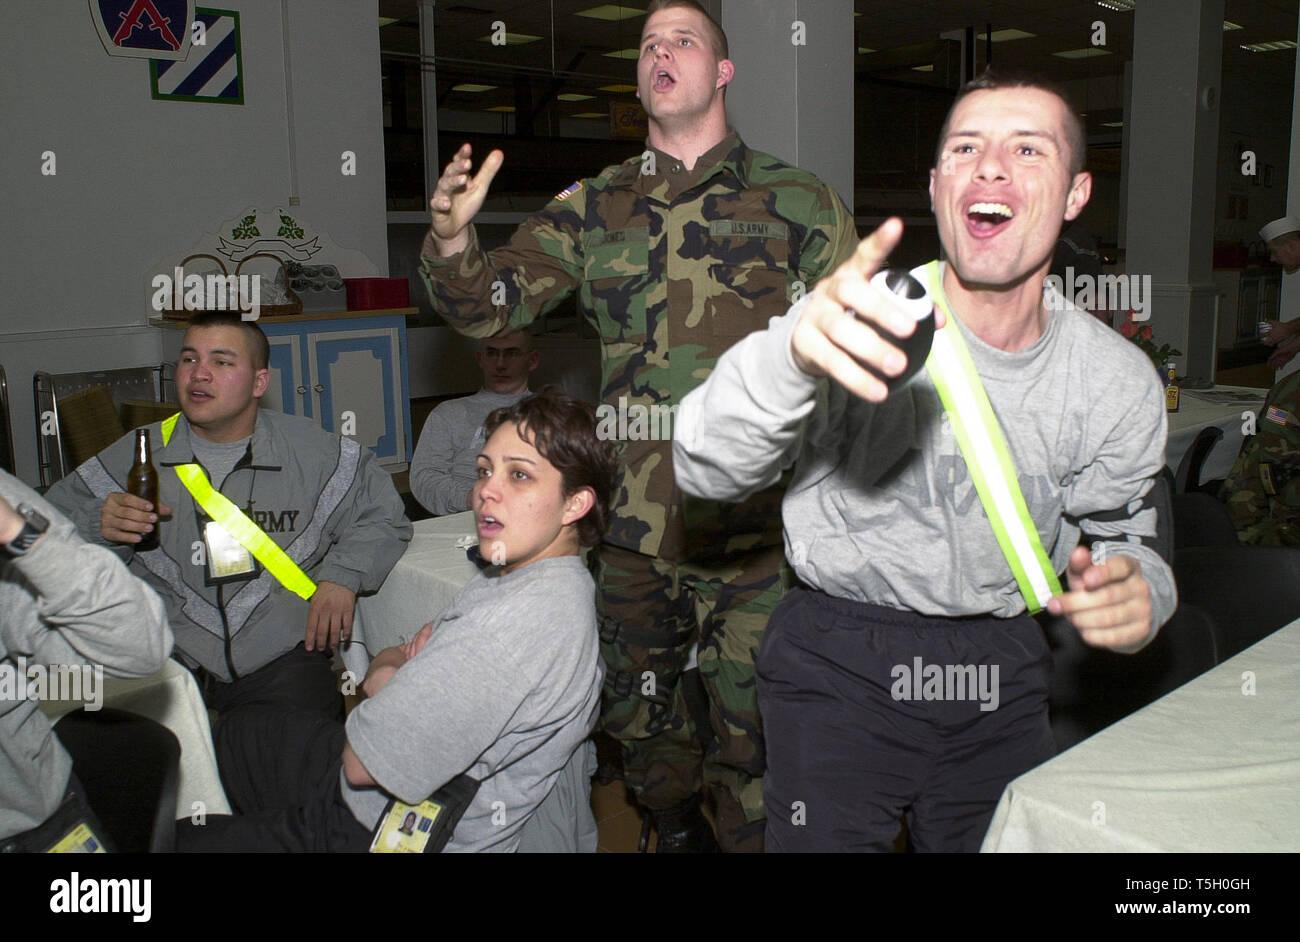 February 4, 2002 - Camp Monteith, Kosovo, Yugoslavia - Pfc